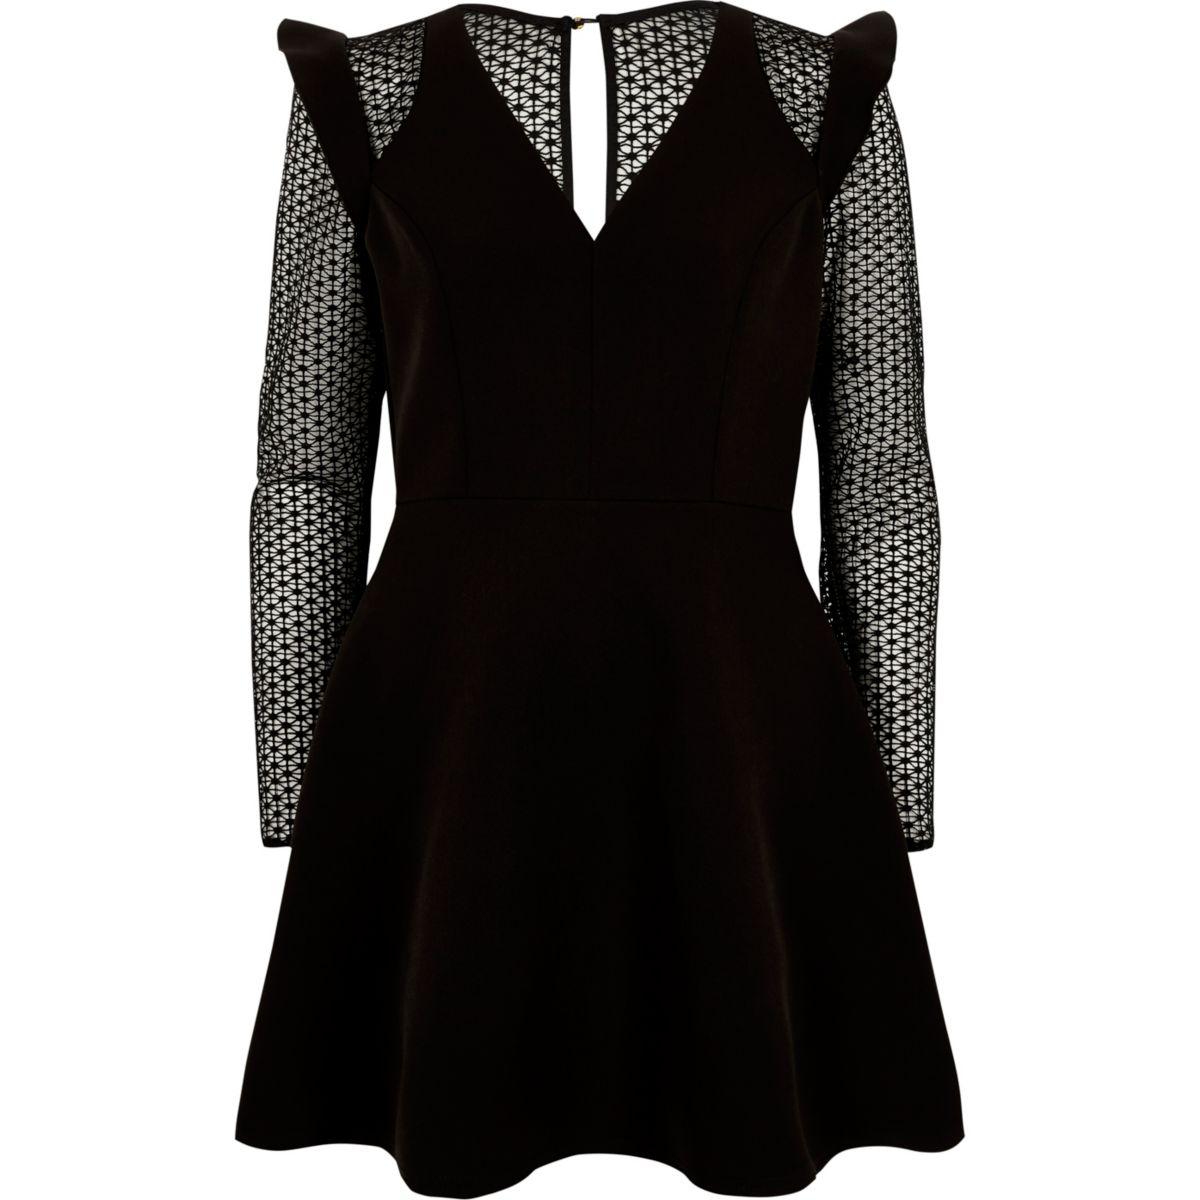 Black lace long sleeve frill skater dress